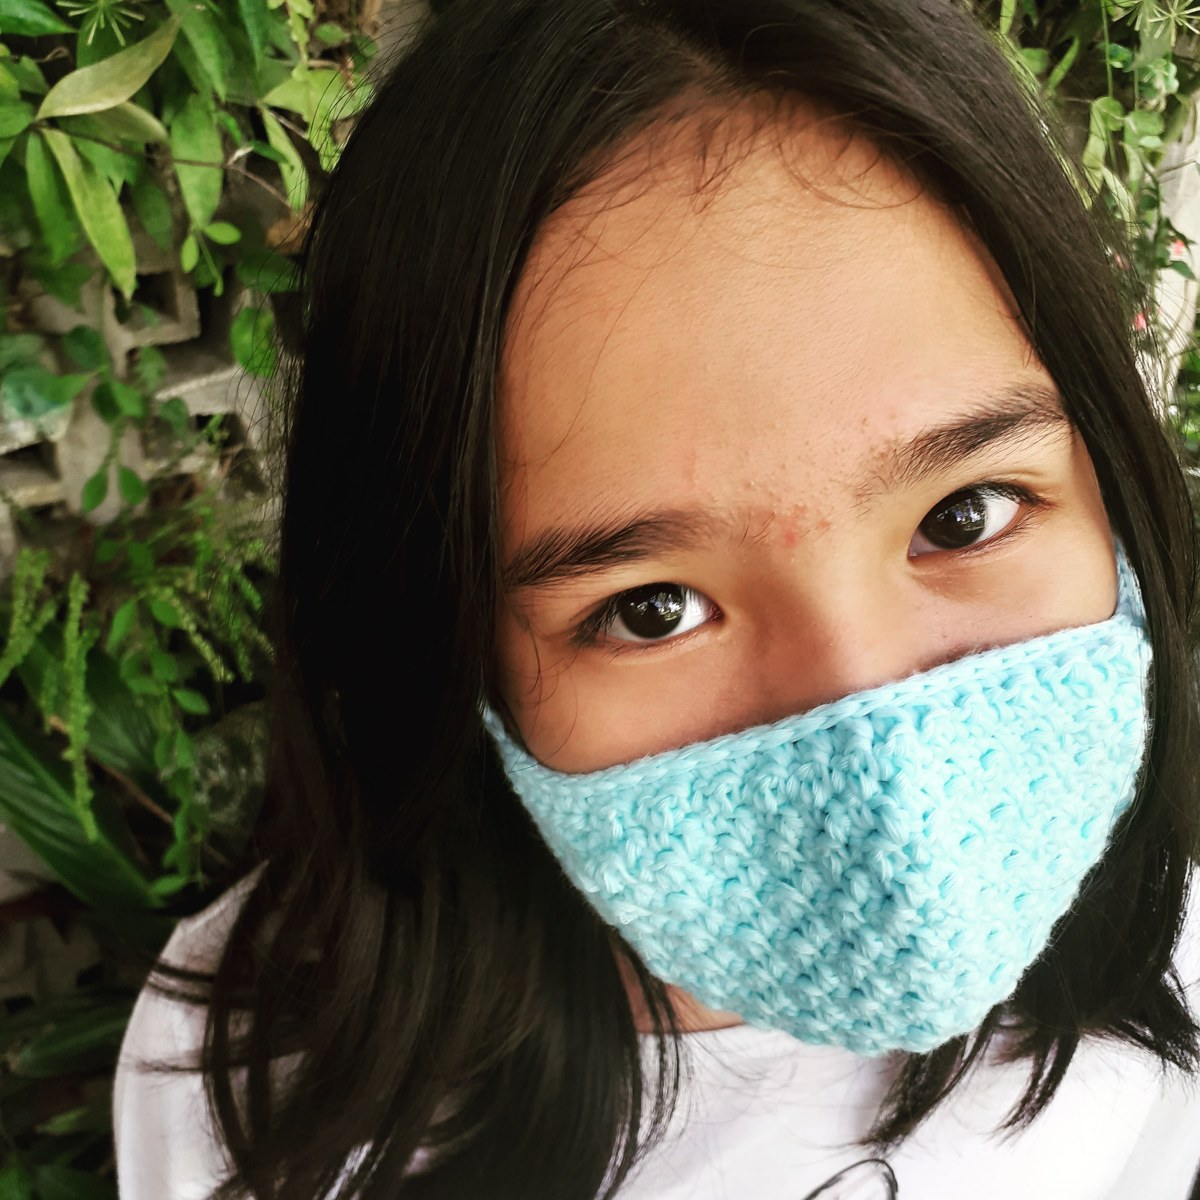 Crochet Seed Face Mask